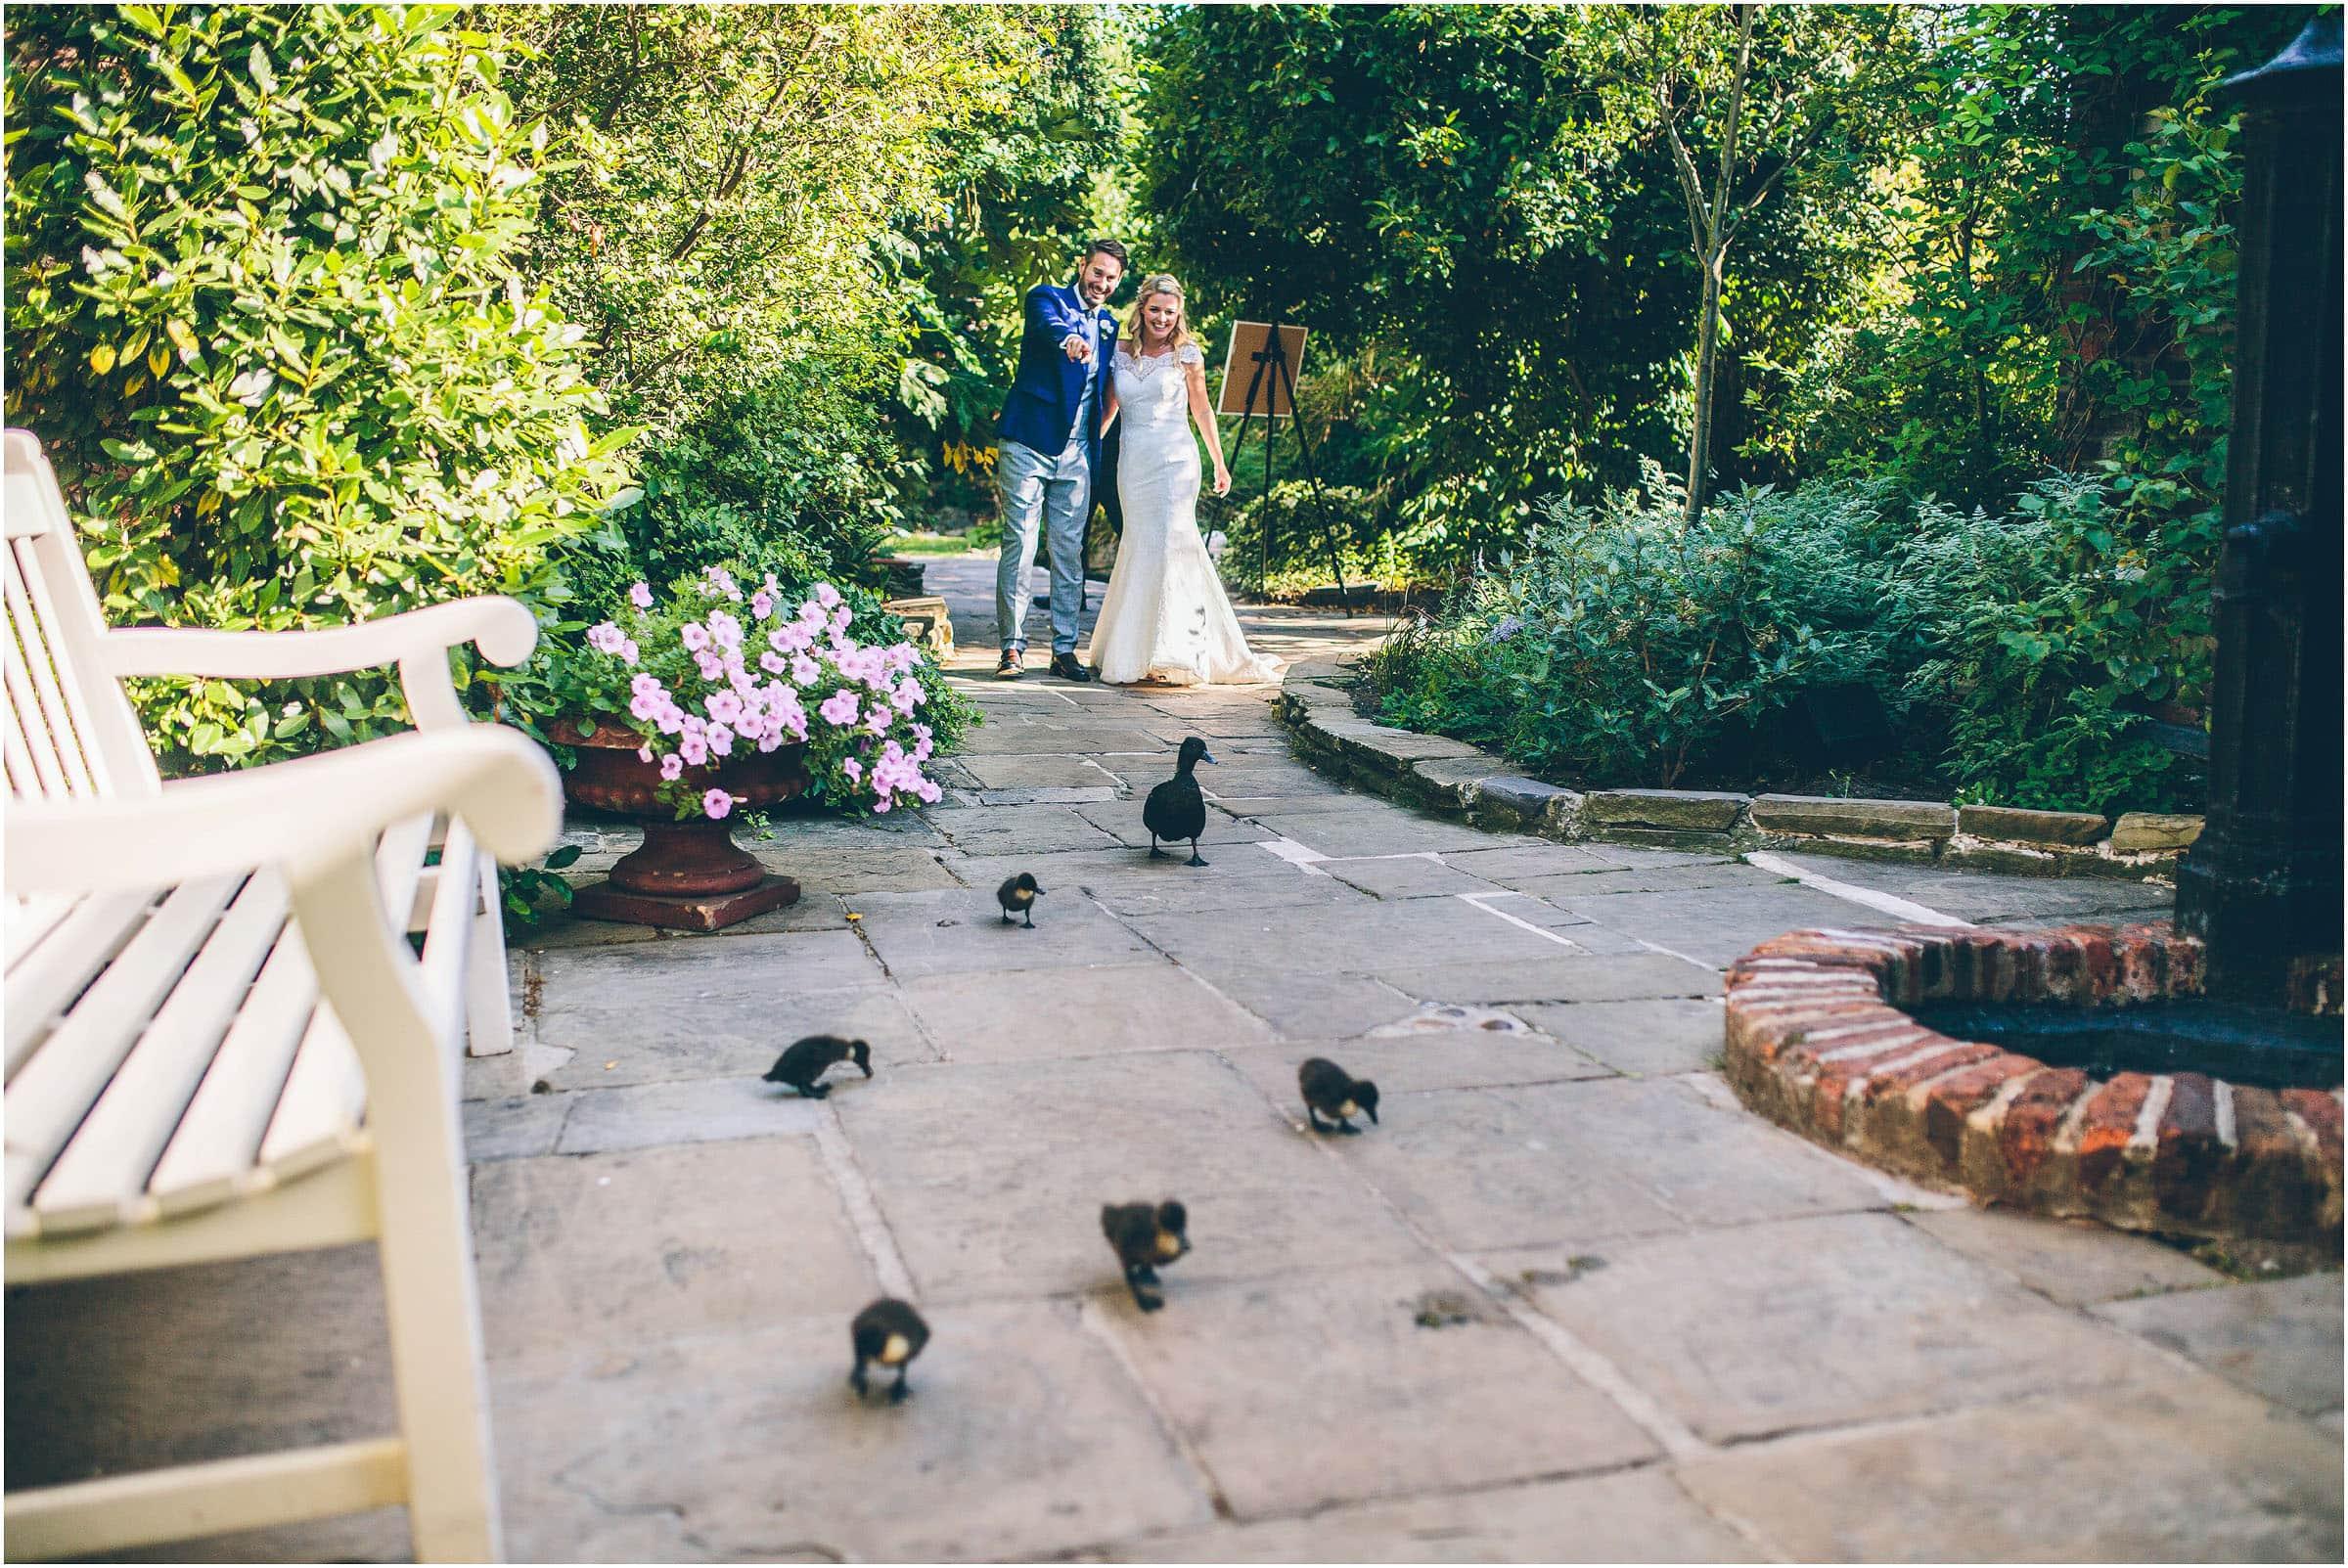 Kensington_Roof_Gardens_Wedding_Photography_0079